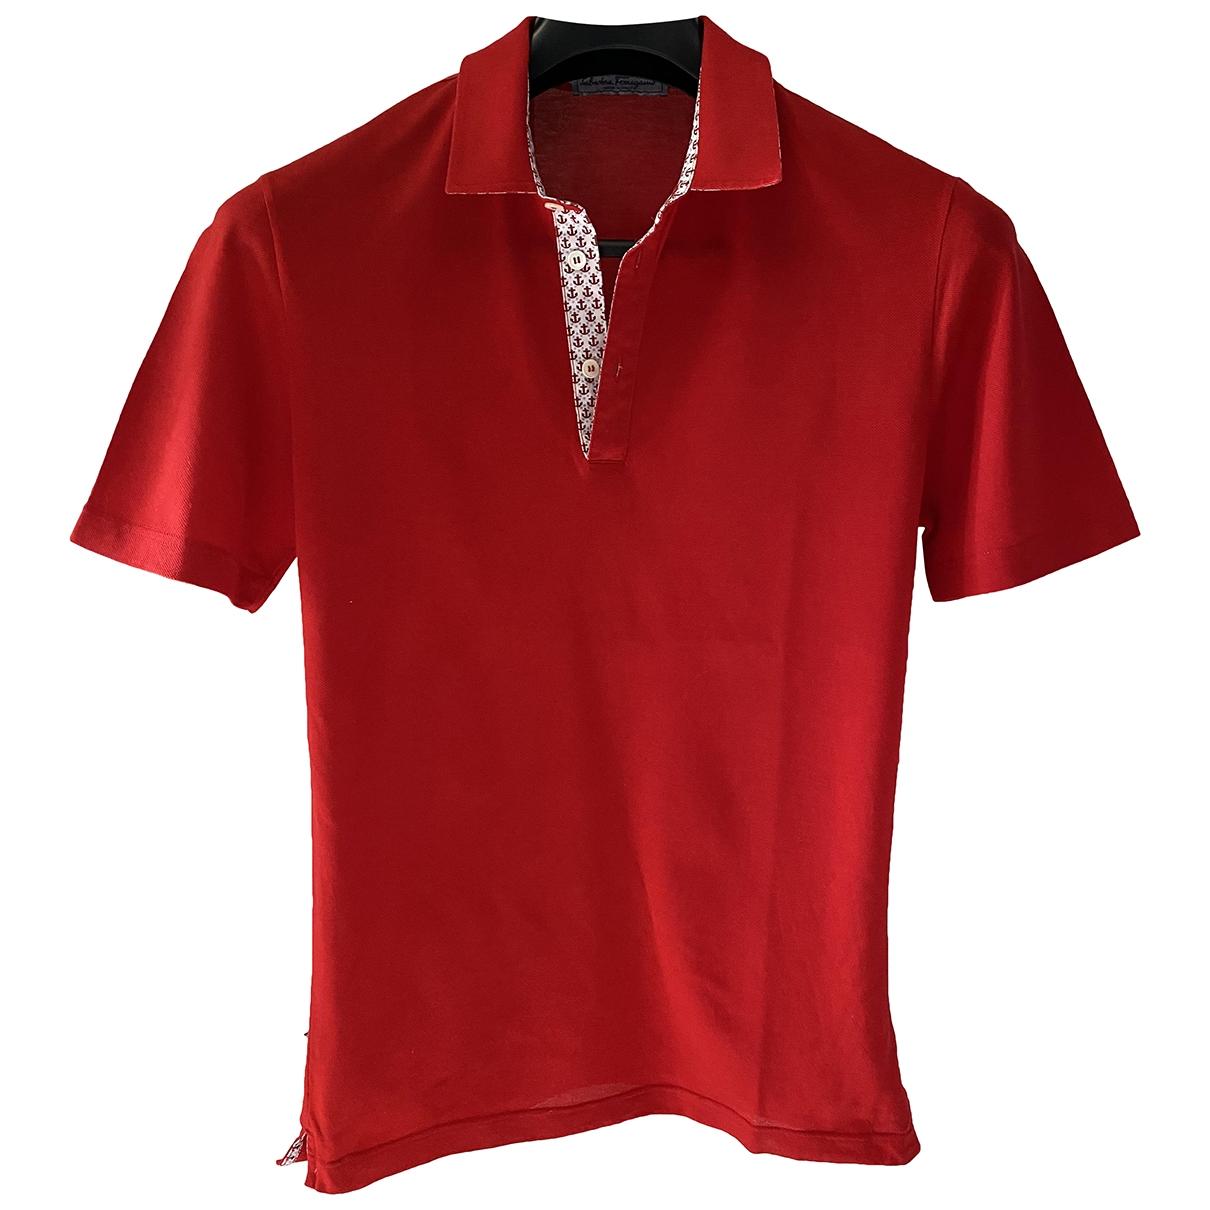 Salvatore Ferragamo \N Red Cotton Polo shirts for Men S International